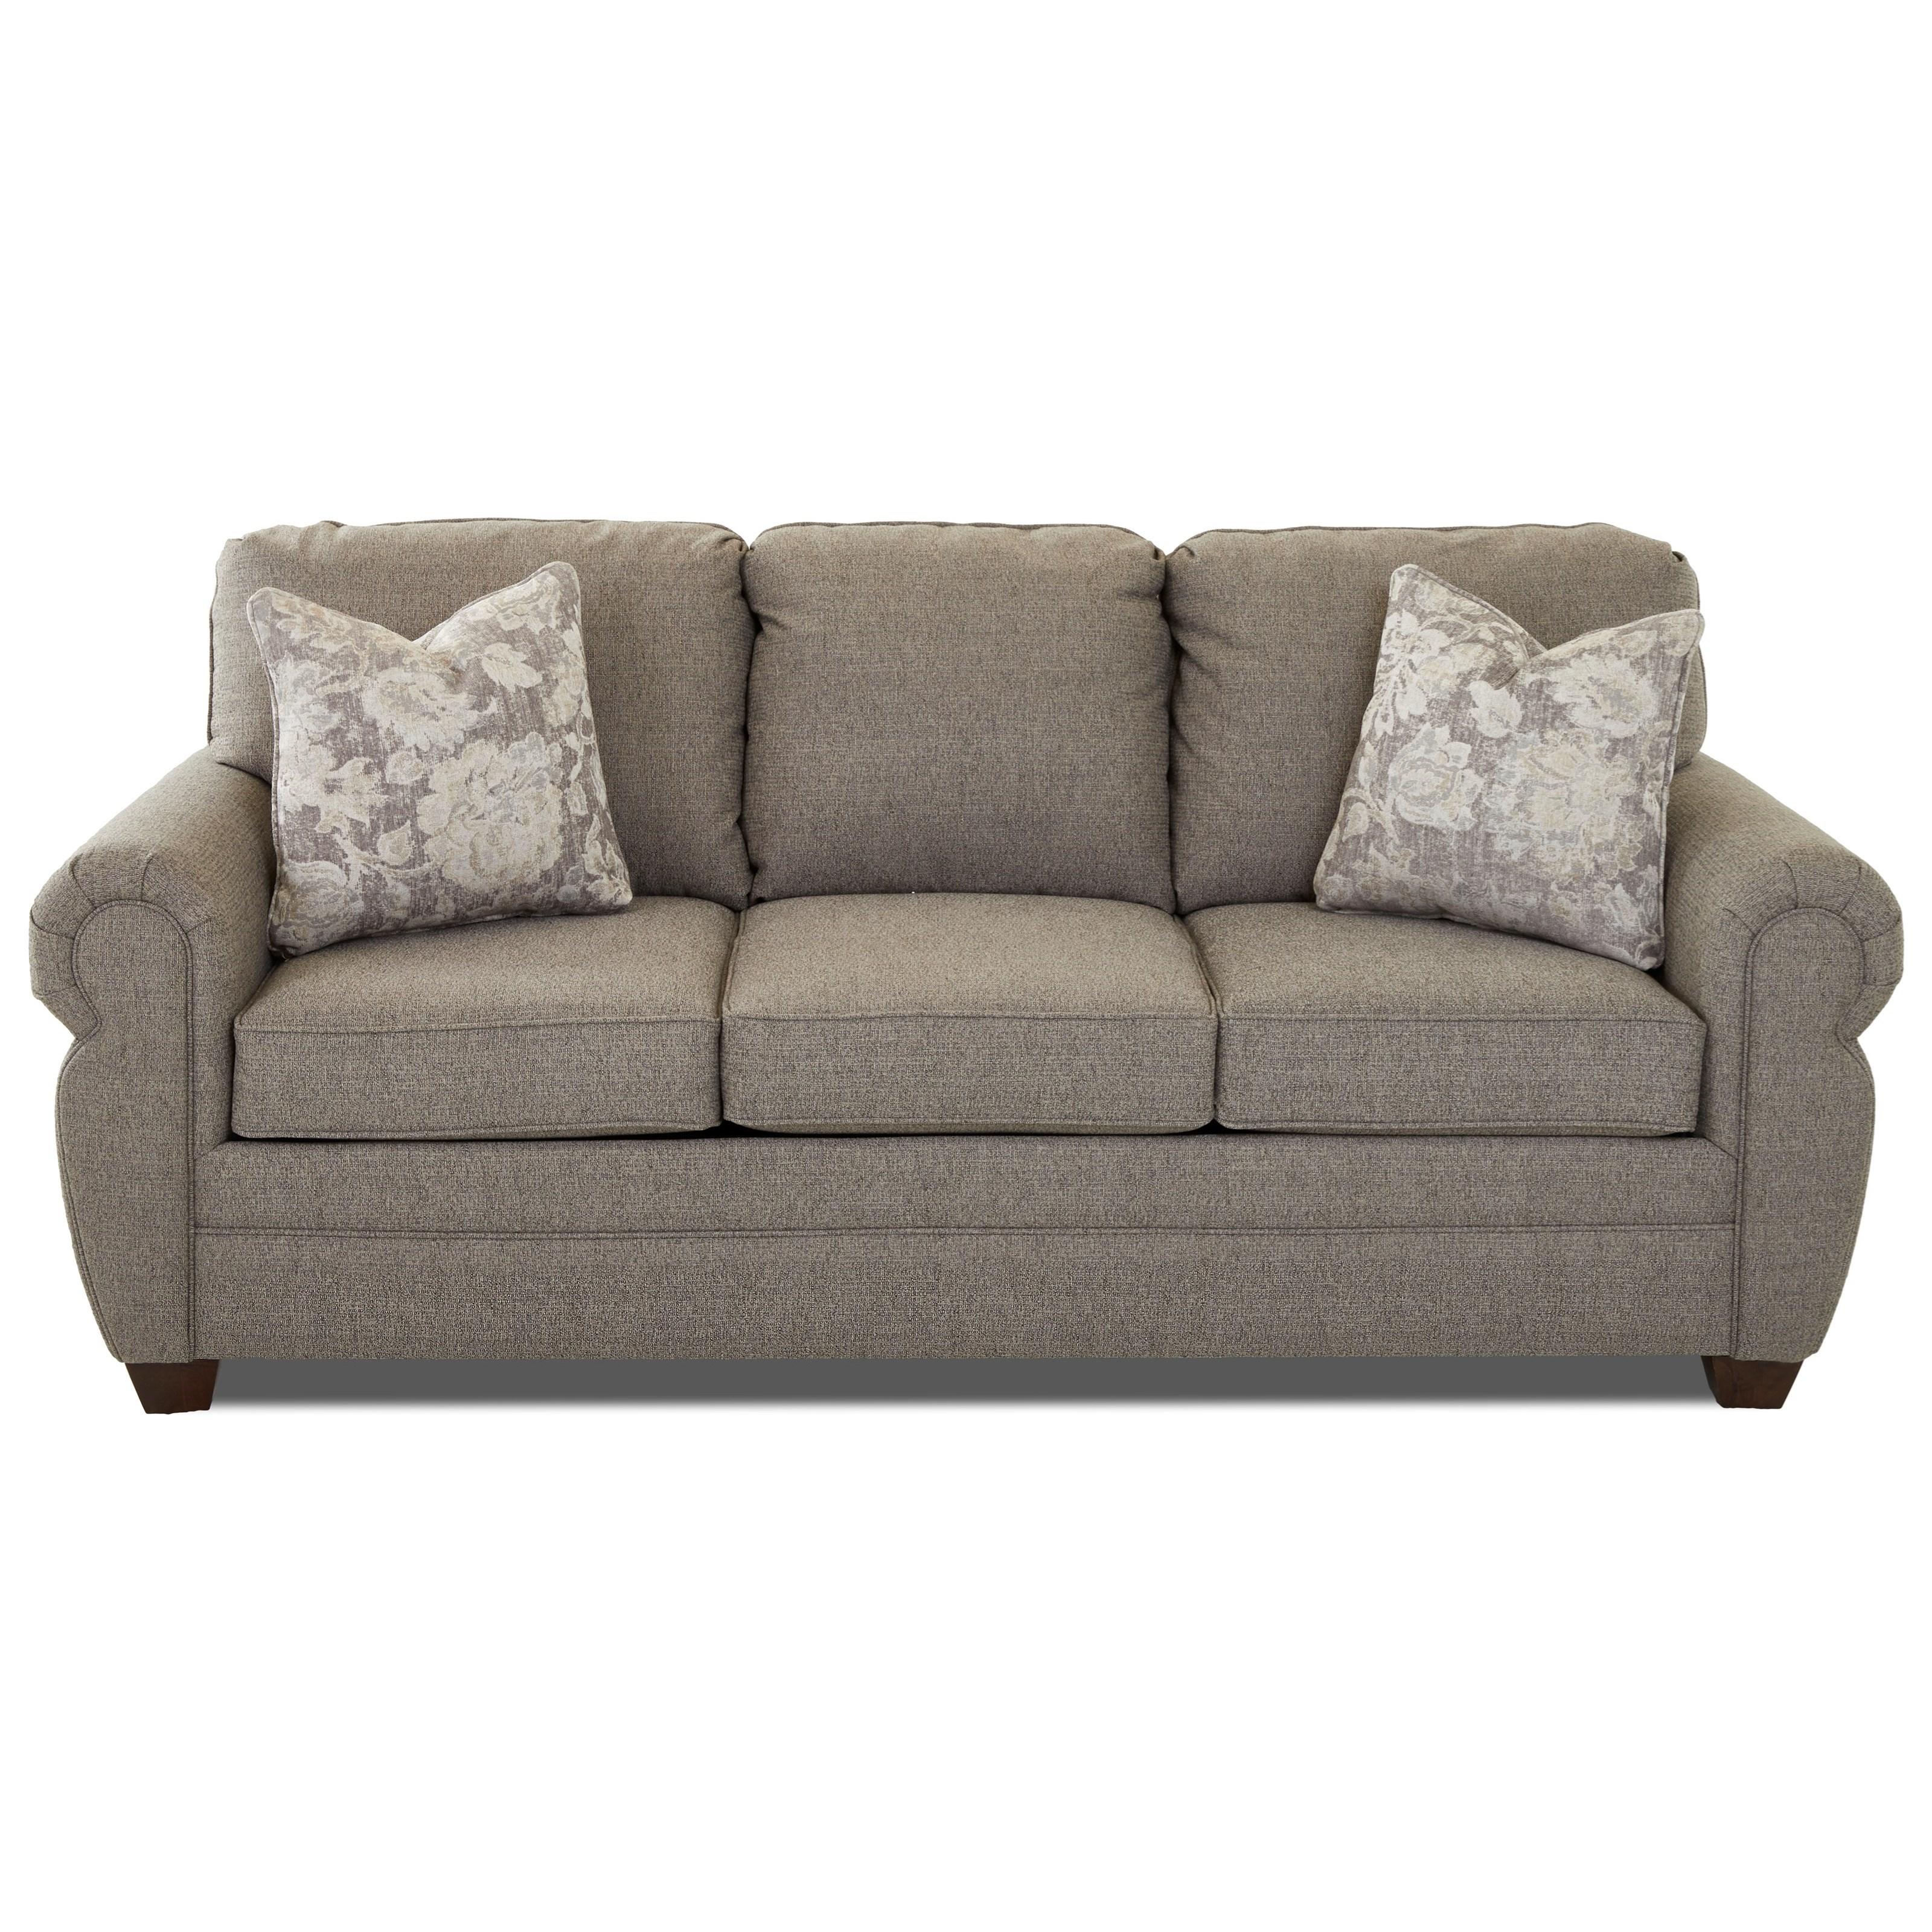 Westbrook Sleeper Sofa w/ Enso MemoryFoam Mattress by Klaussner at Johnny Janosik